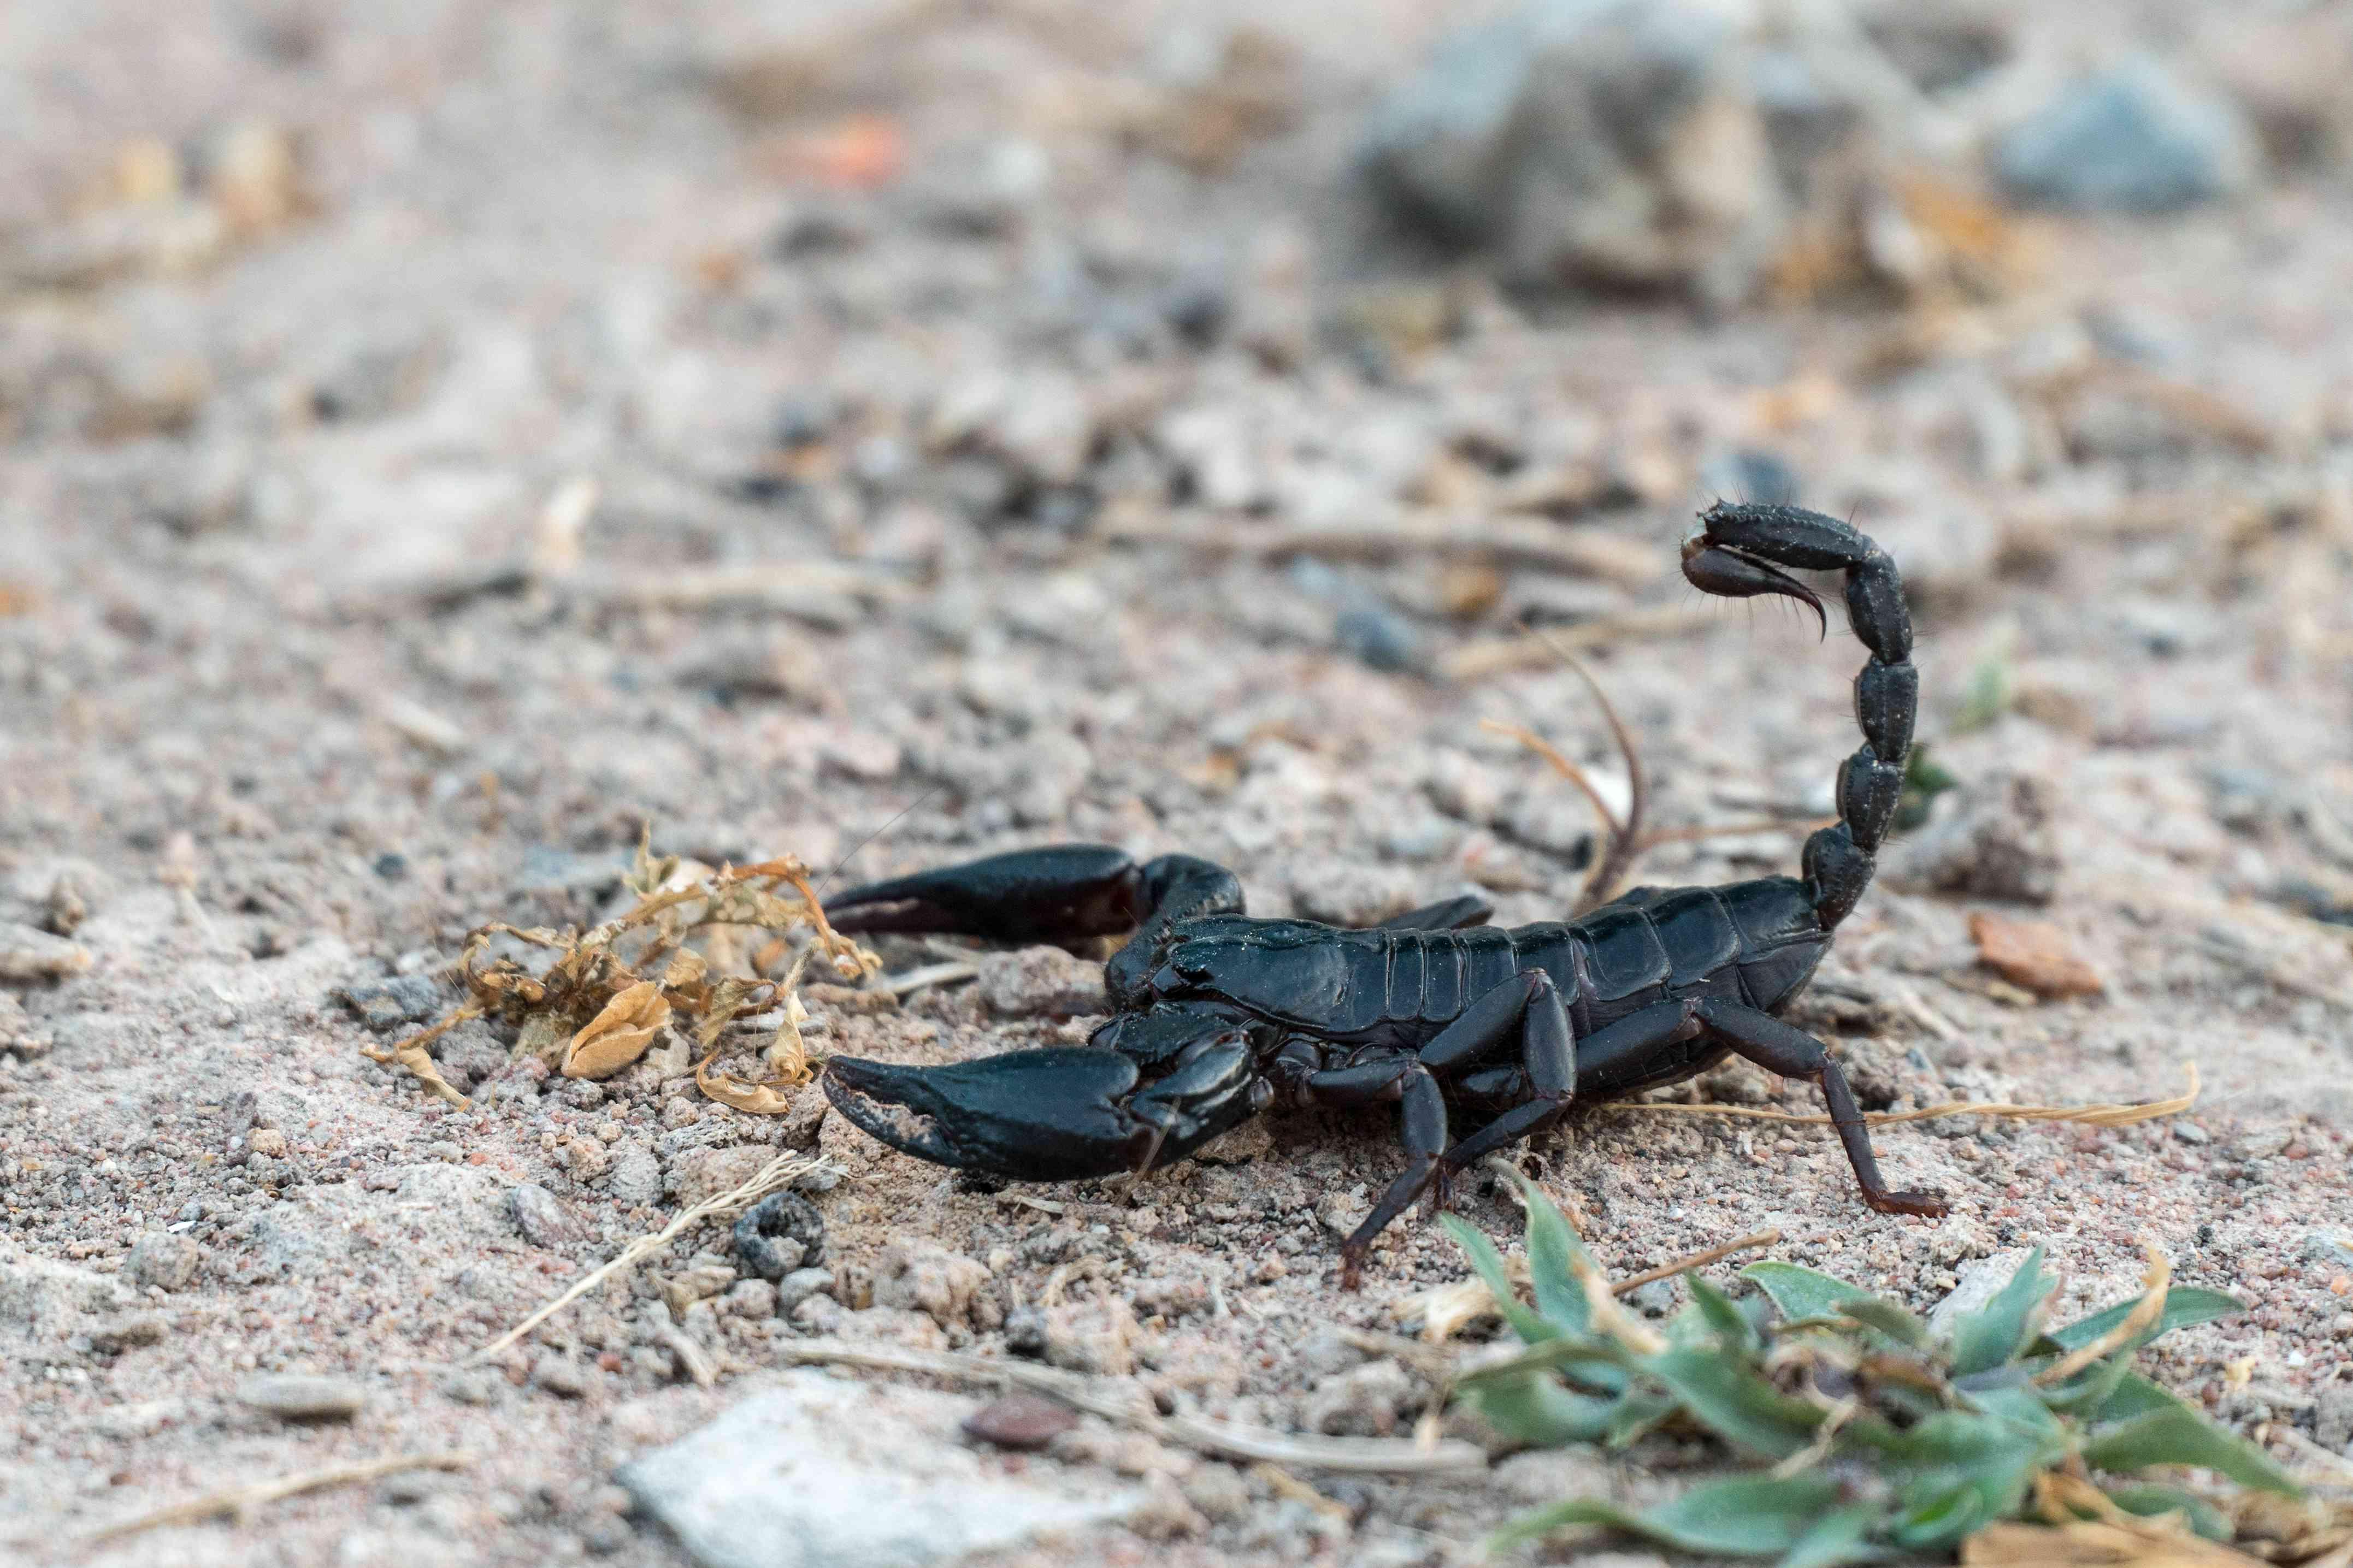 Black scorpion walking across sandy ground.